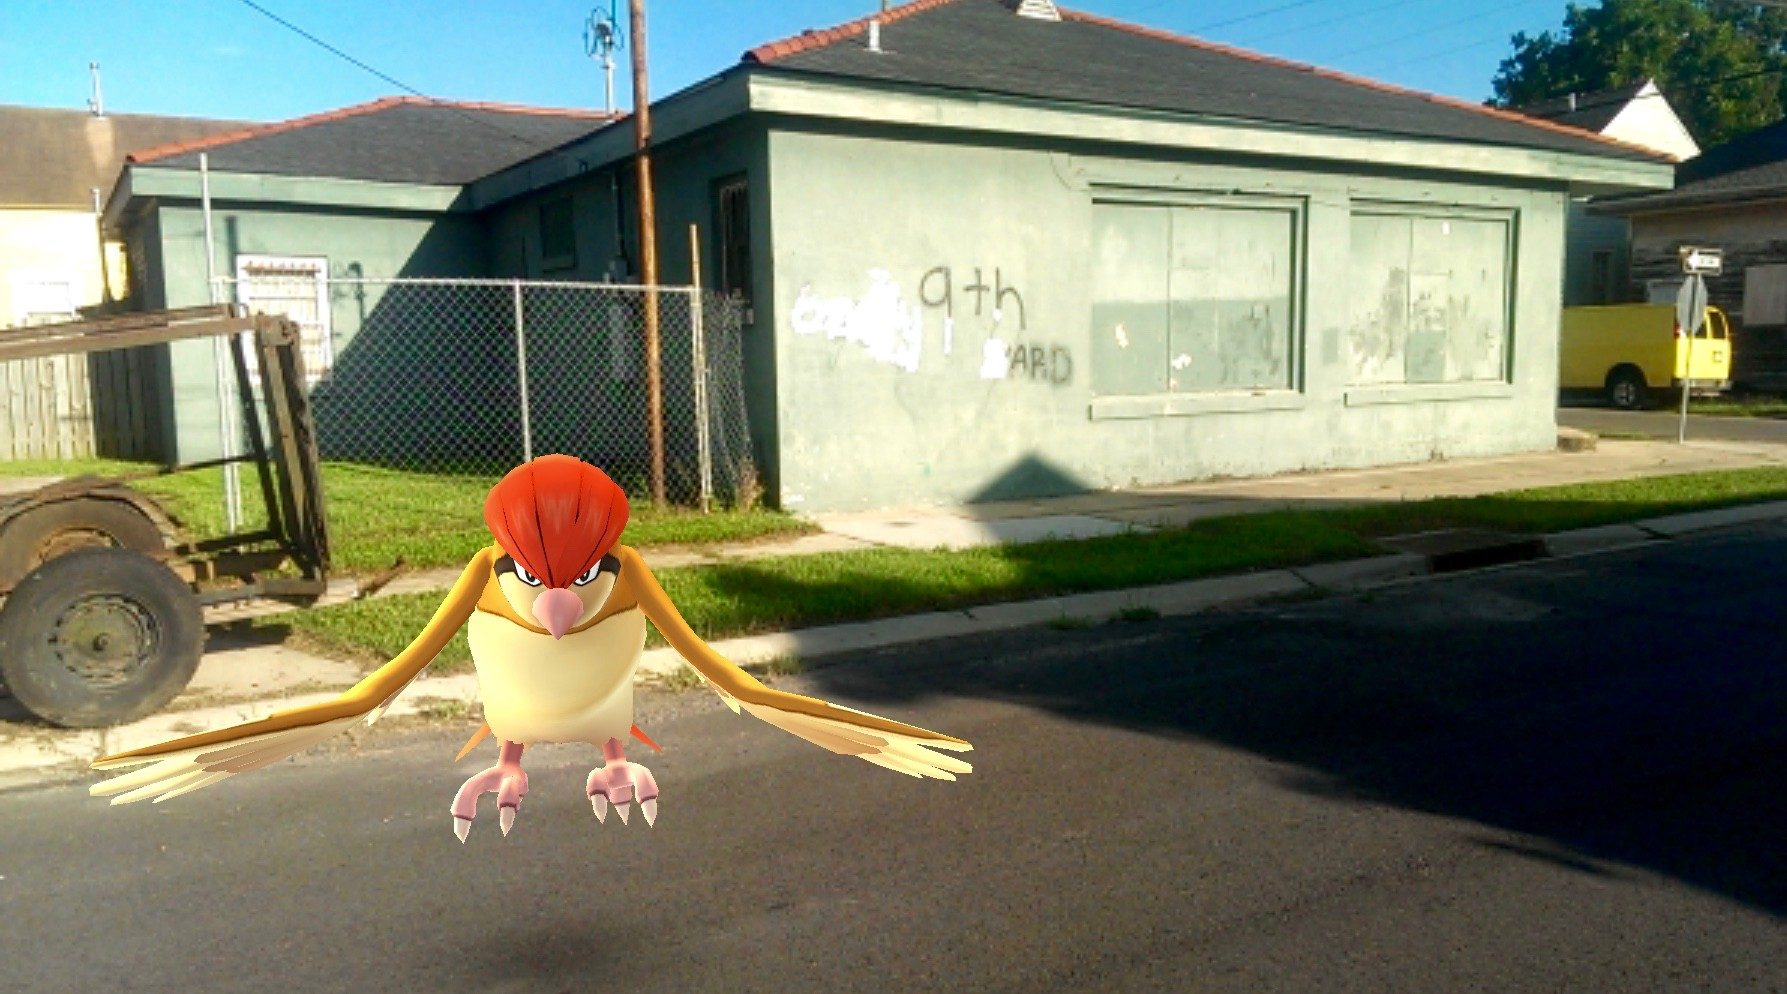 Pokemon in the Ninth Ward